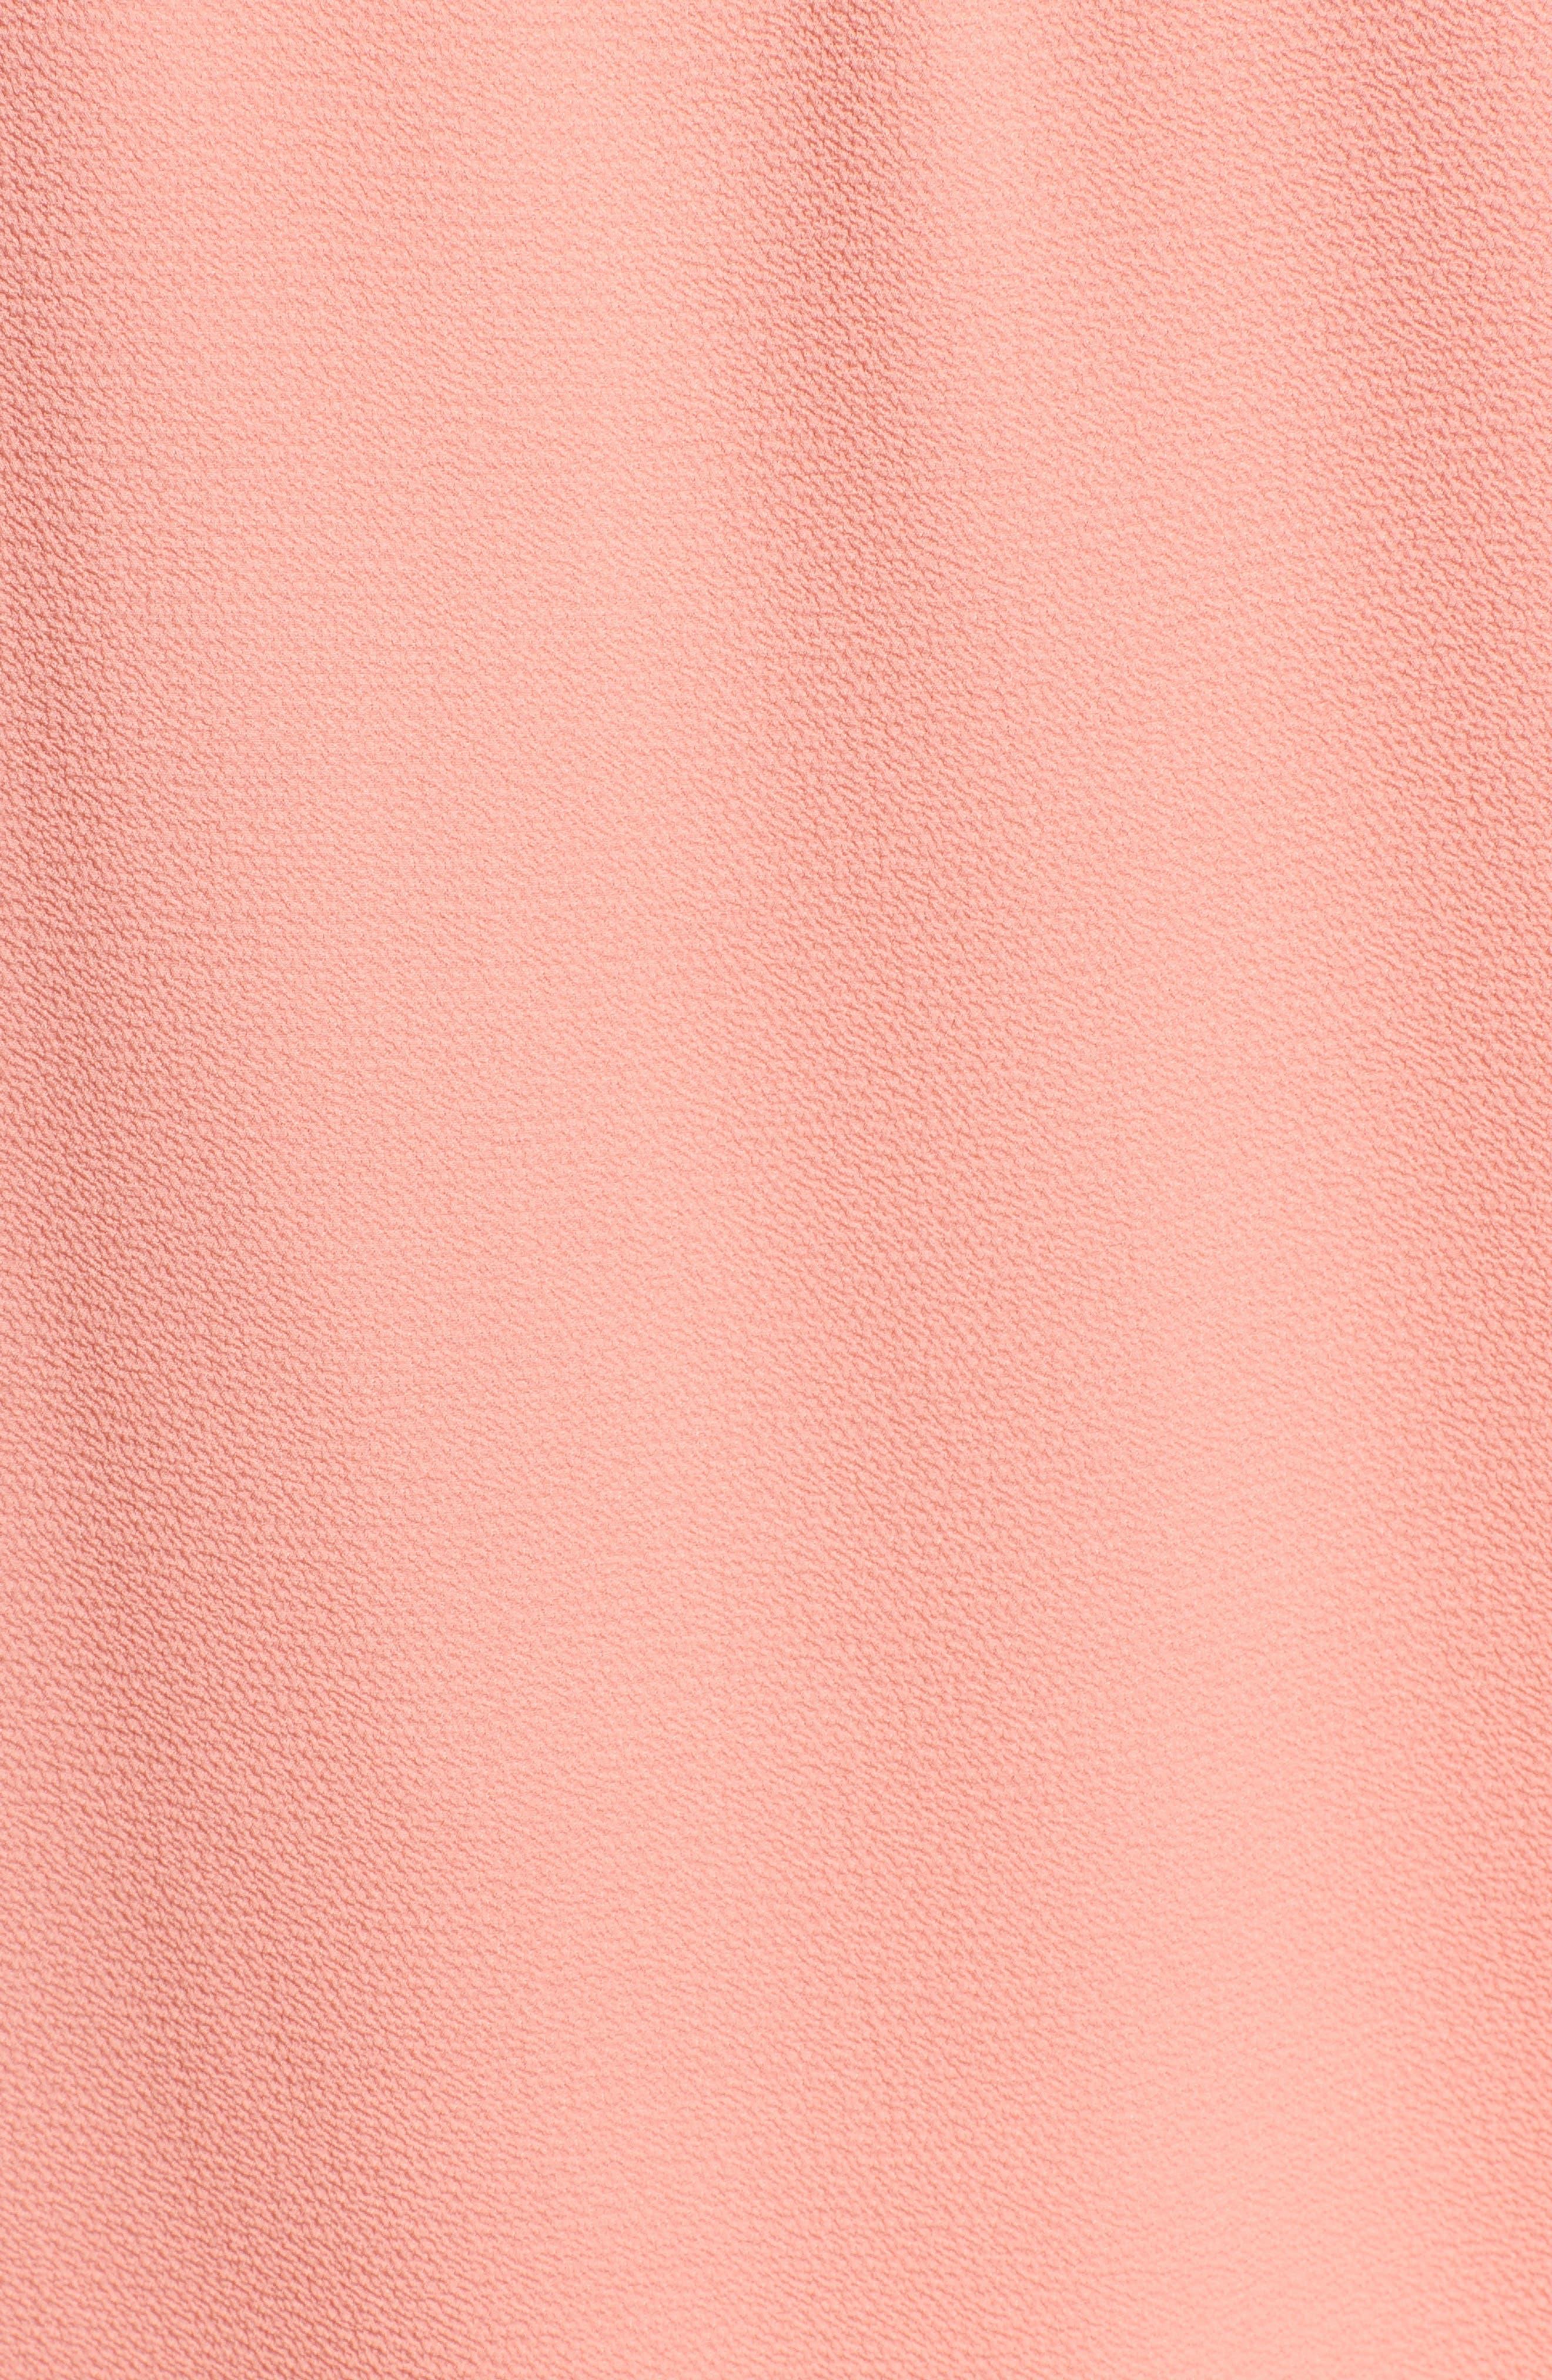 Pintuck Sleeveless Crepe Blouse,                             Alternate thumbnail 6, color,                             892-Sweet Papaya